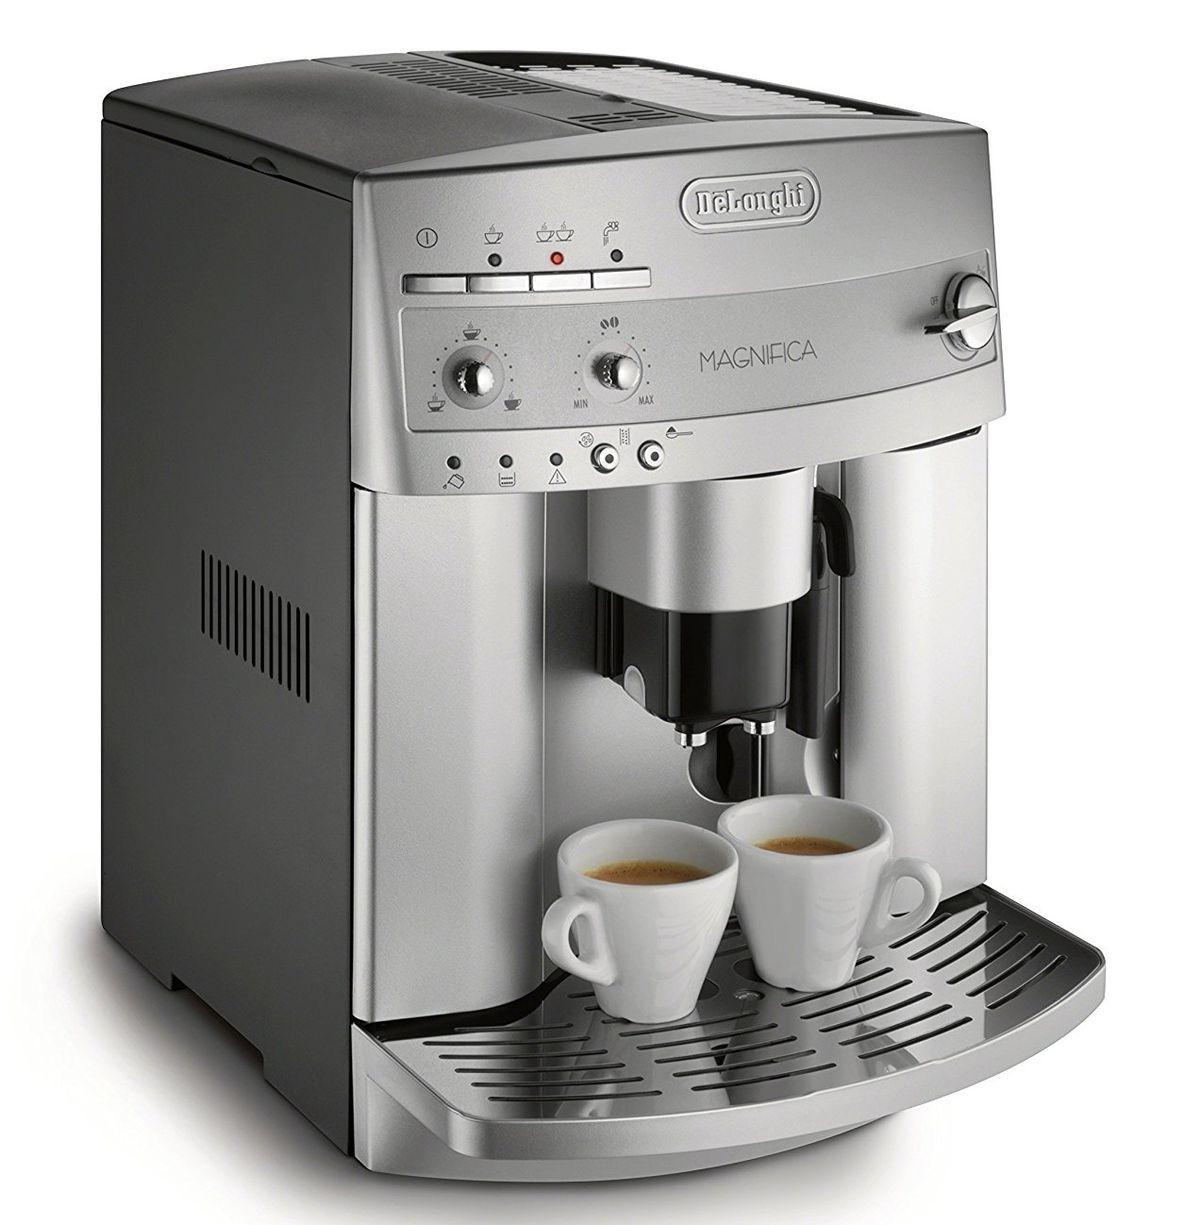 12 of the best espresso machines, according to online